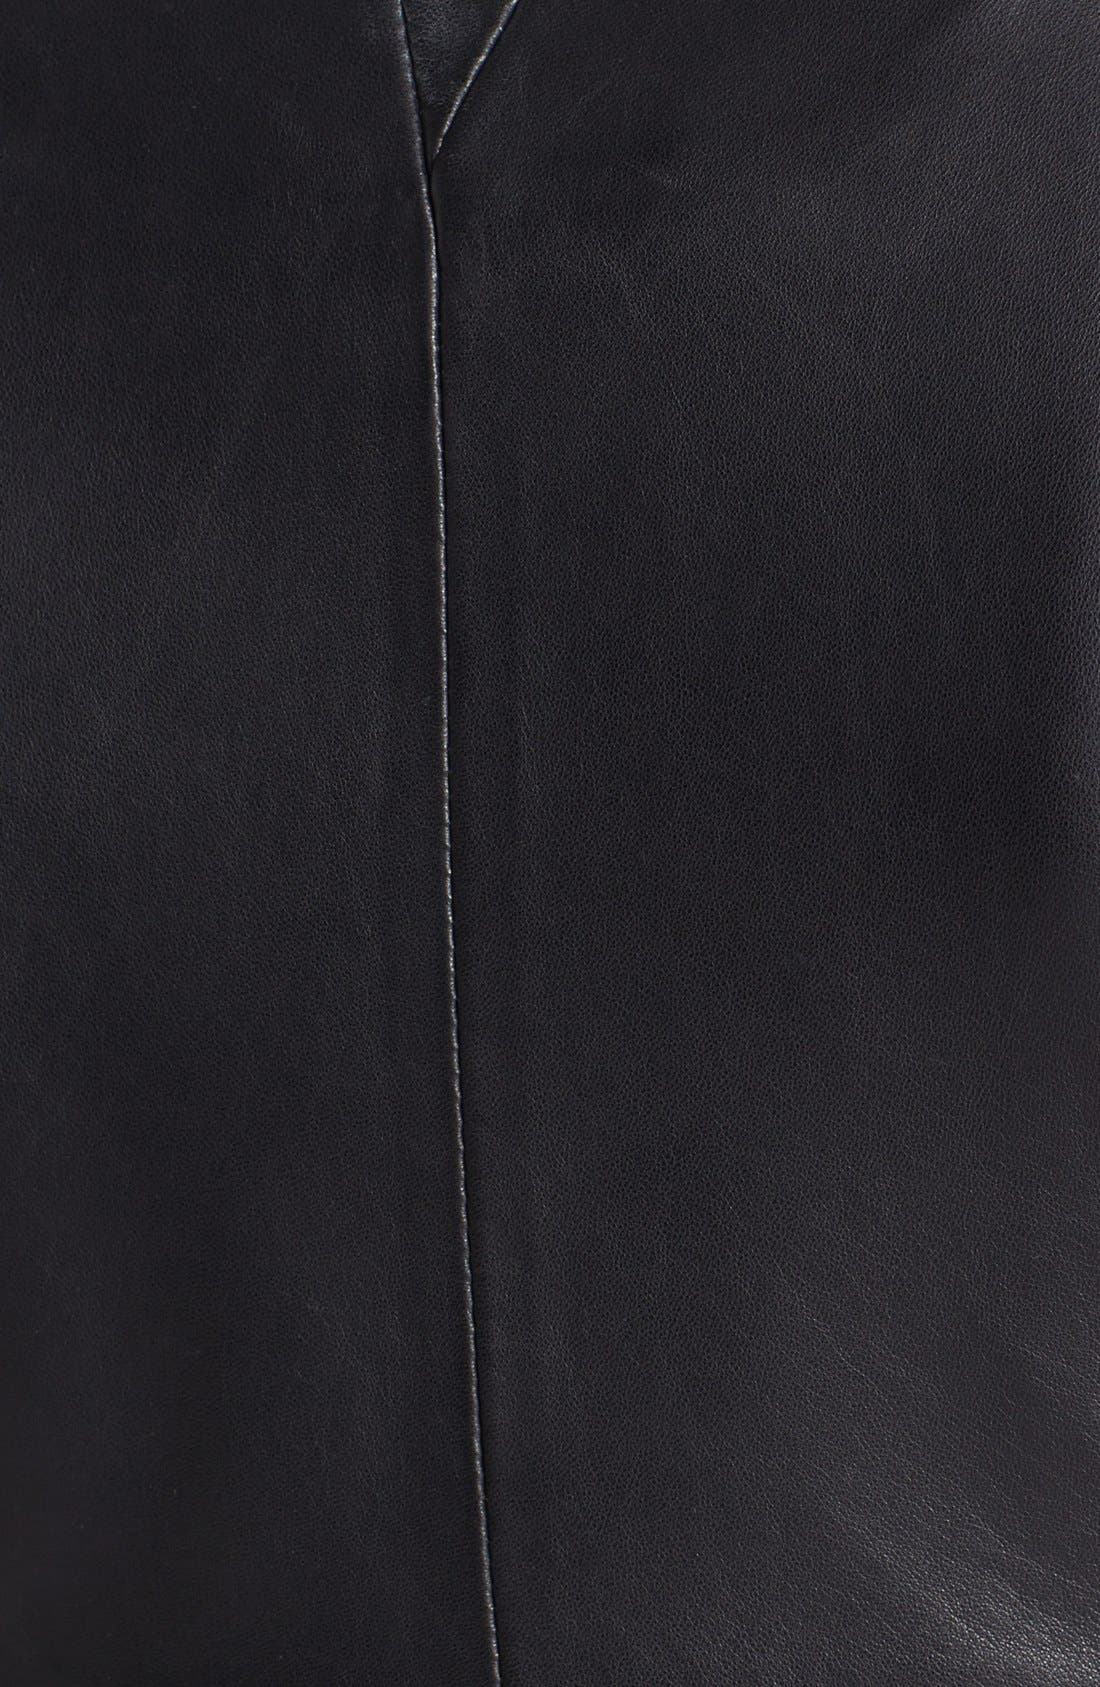 Leather Peplum Jacket,                             Alternate thumbnail 3, color,                             001